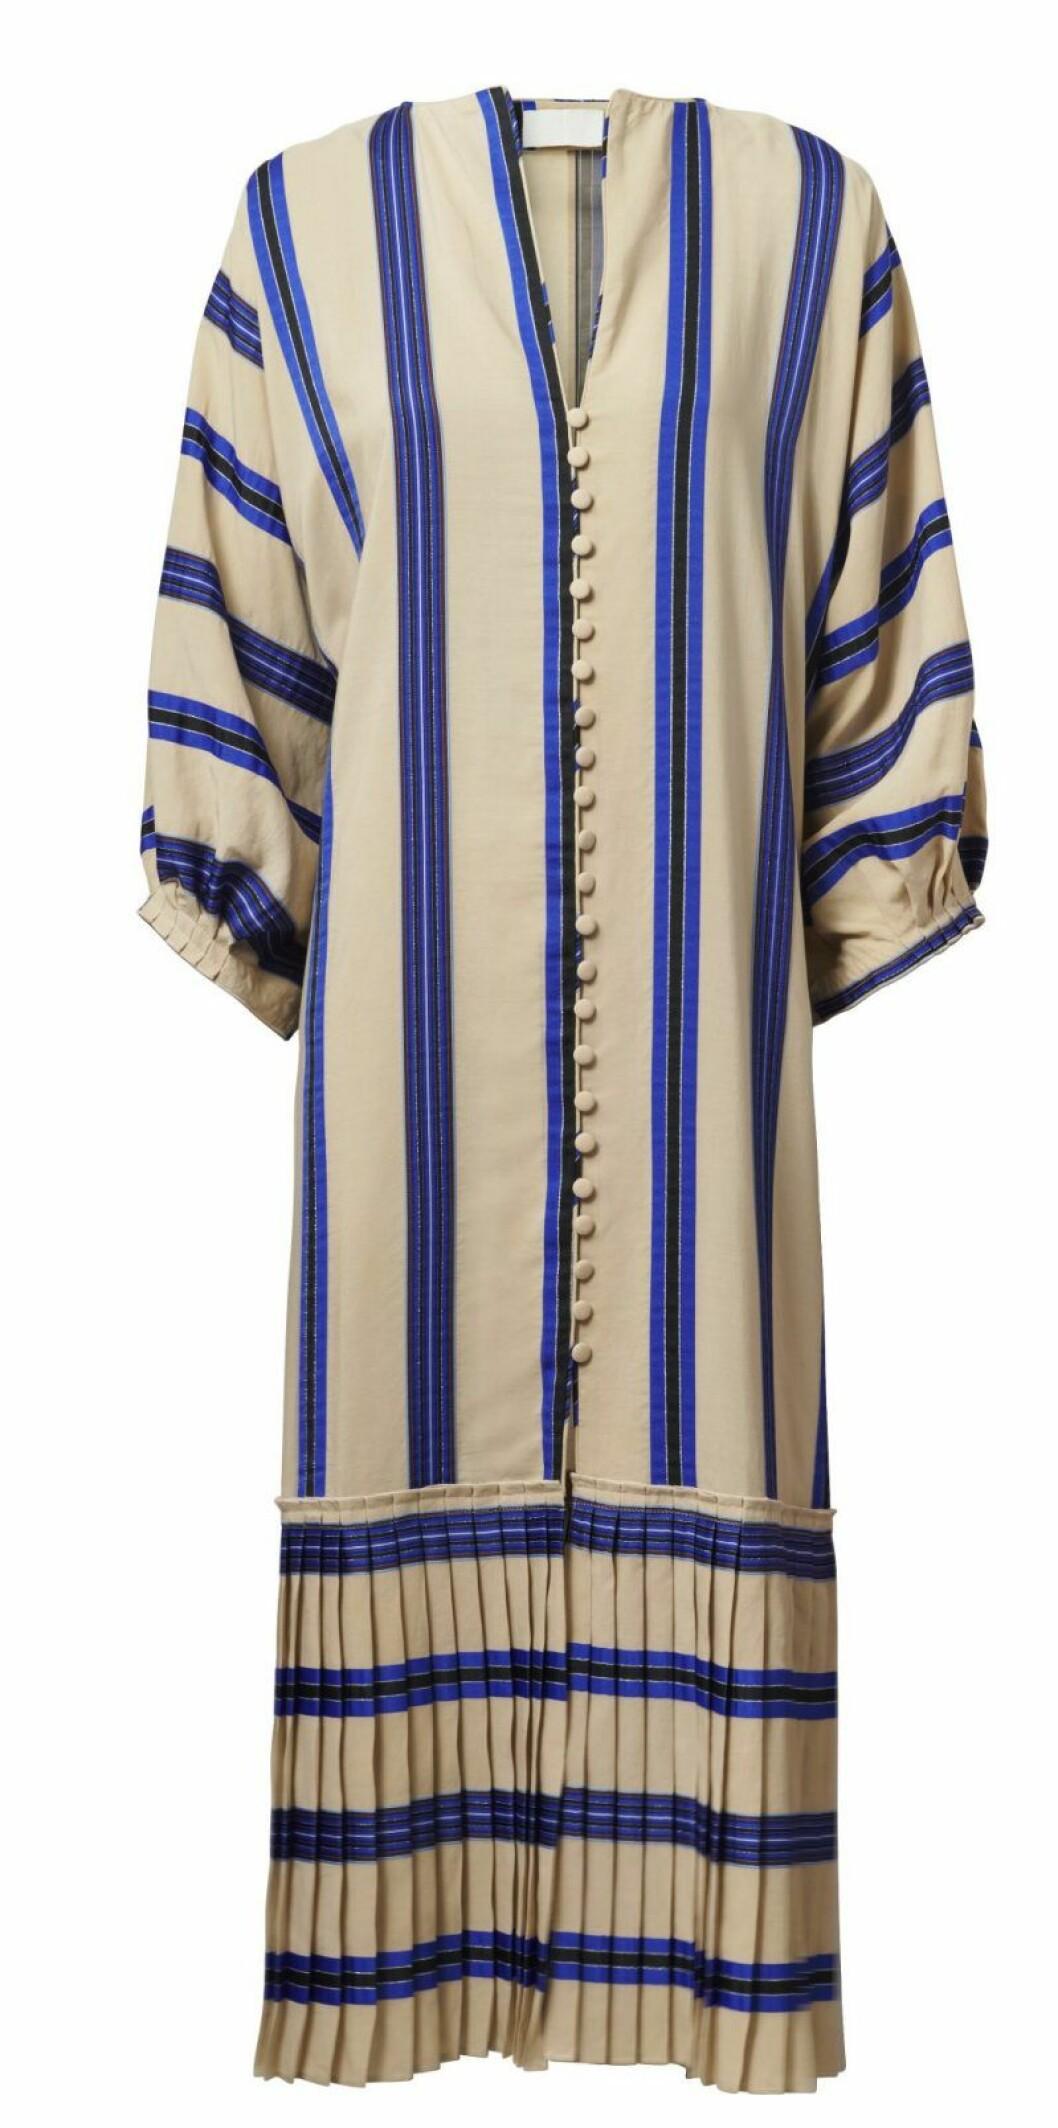 H&M Conscious Exclusive SS20 randig klänning